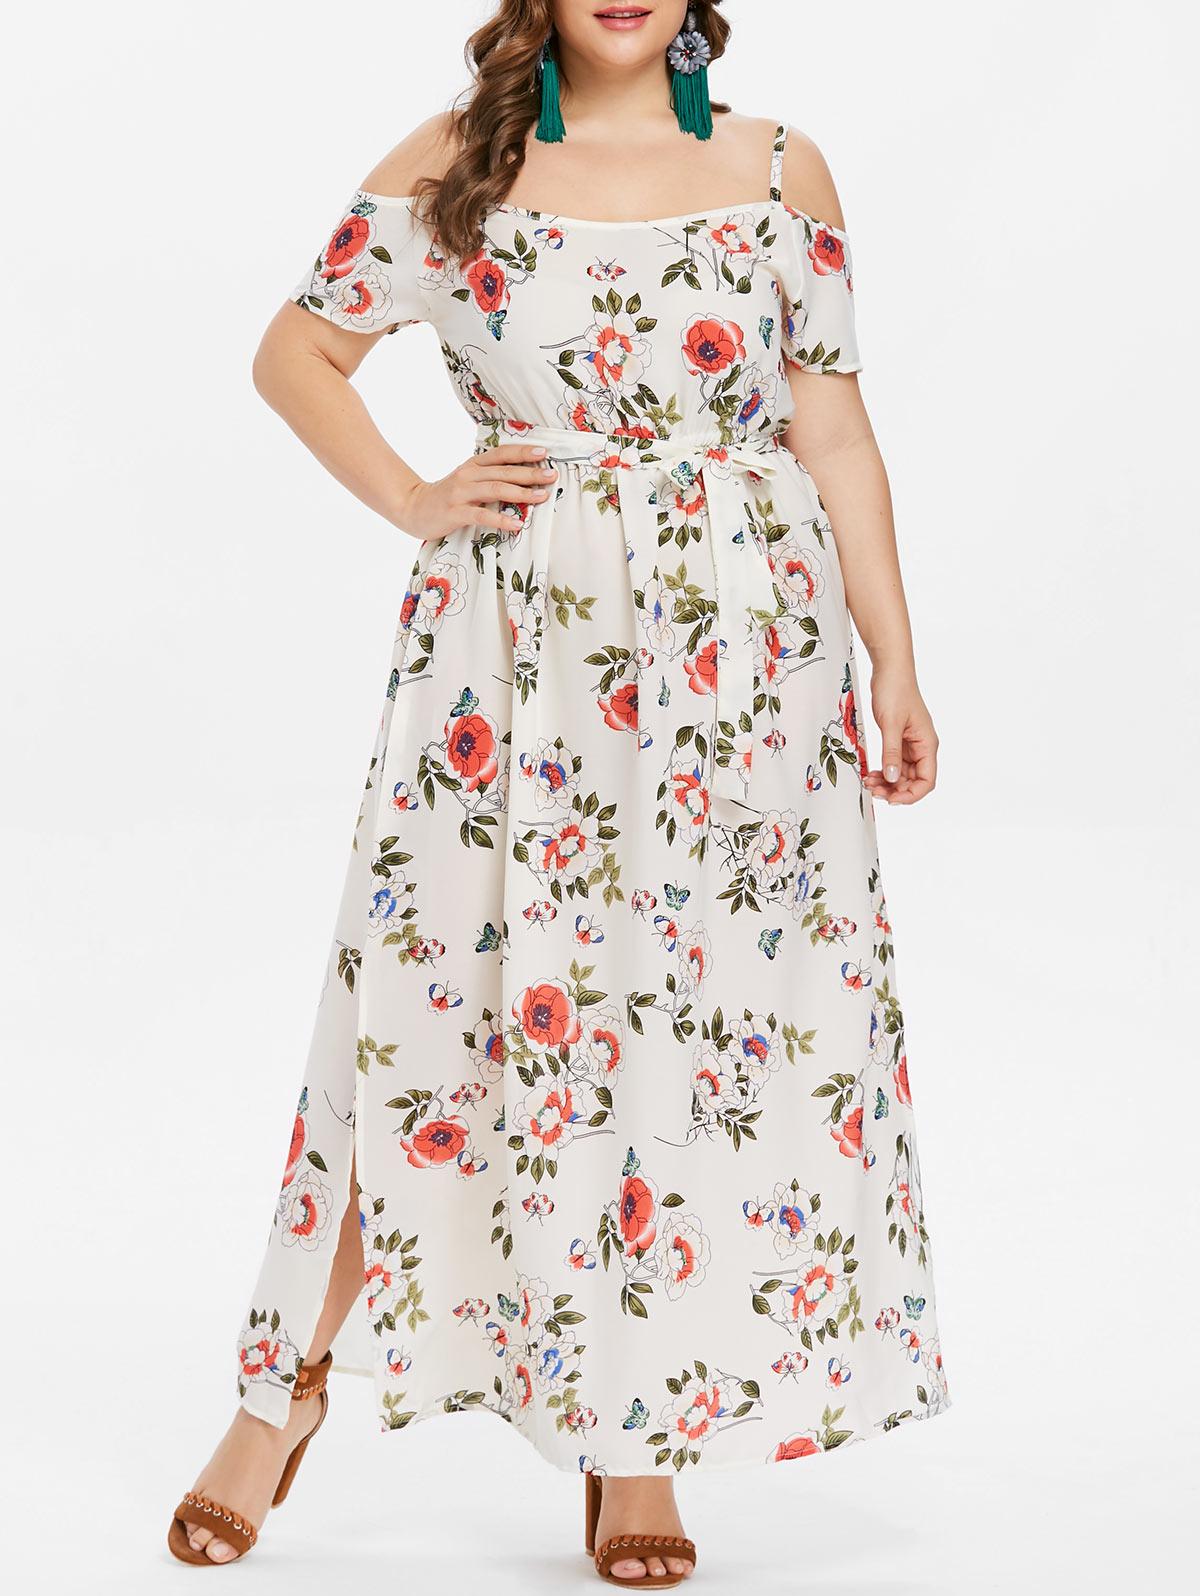 9a3c61ed8092d US $13.99 39% OFF Wipalo Short Sleeve Dress Floral Print Beach Vintage Maxi  Dresses Boho Casual Cold Shoulder Belt Tunic Draped Plus Size Vestido-in ...